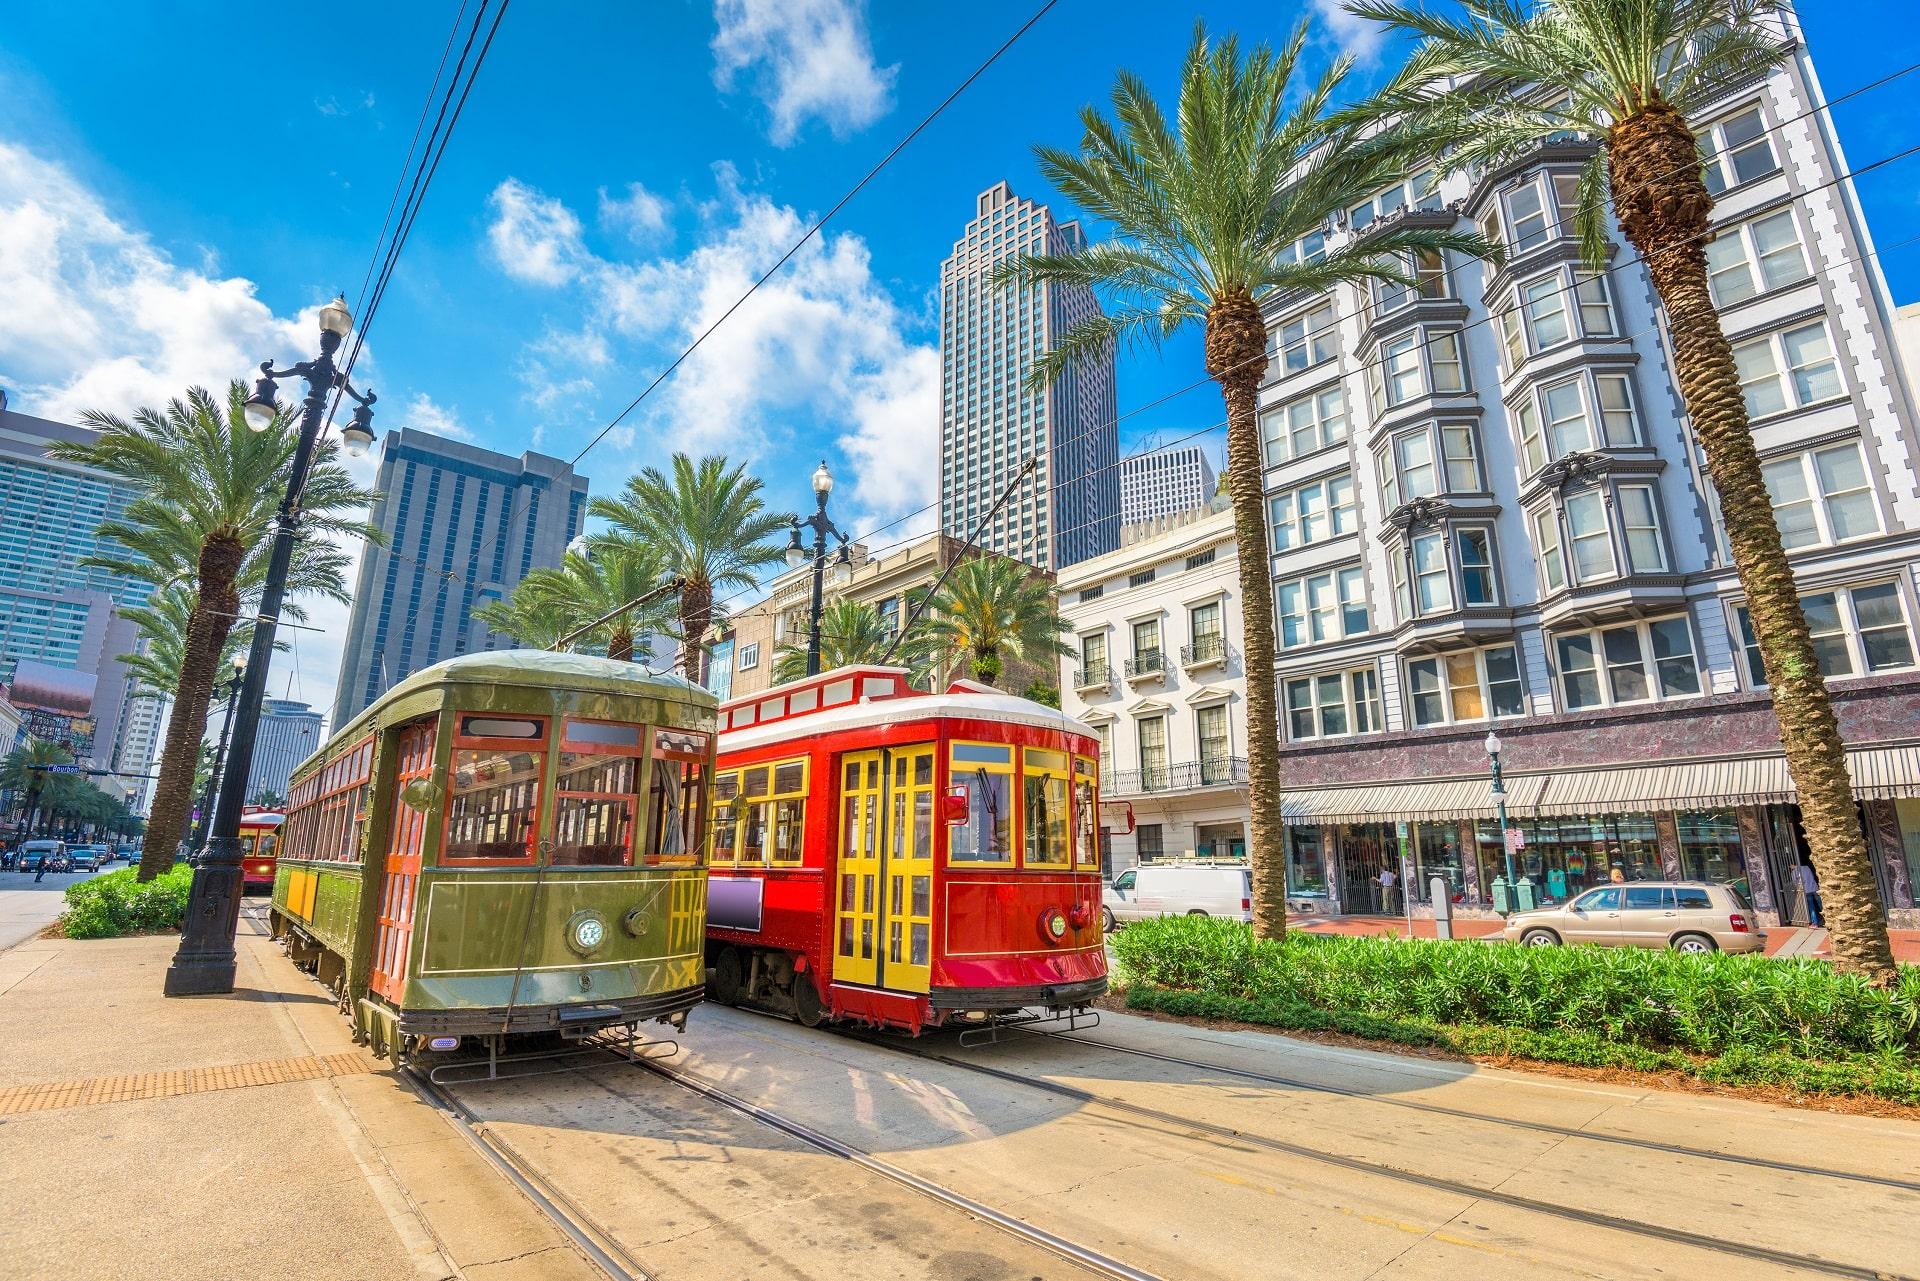 New Orleans Street Cars 664125565